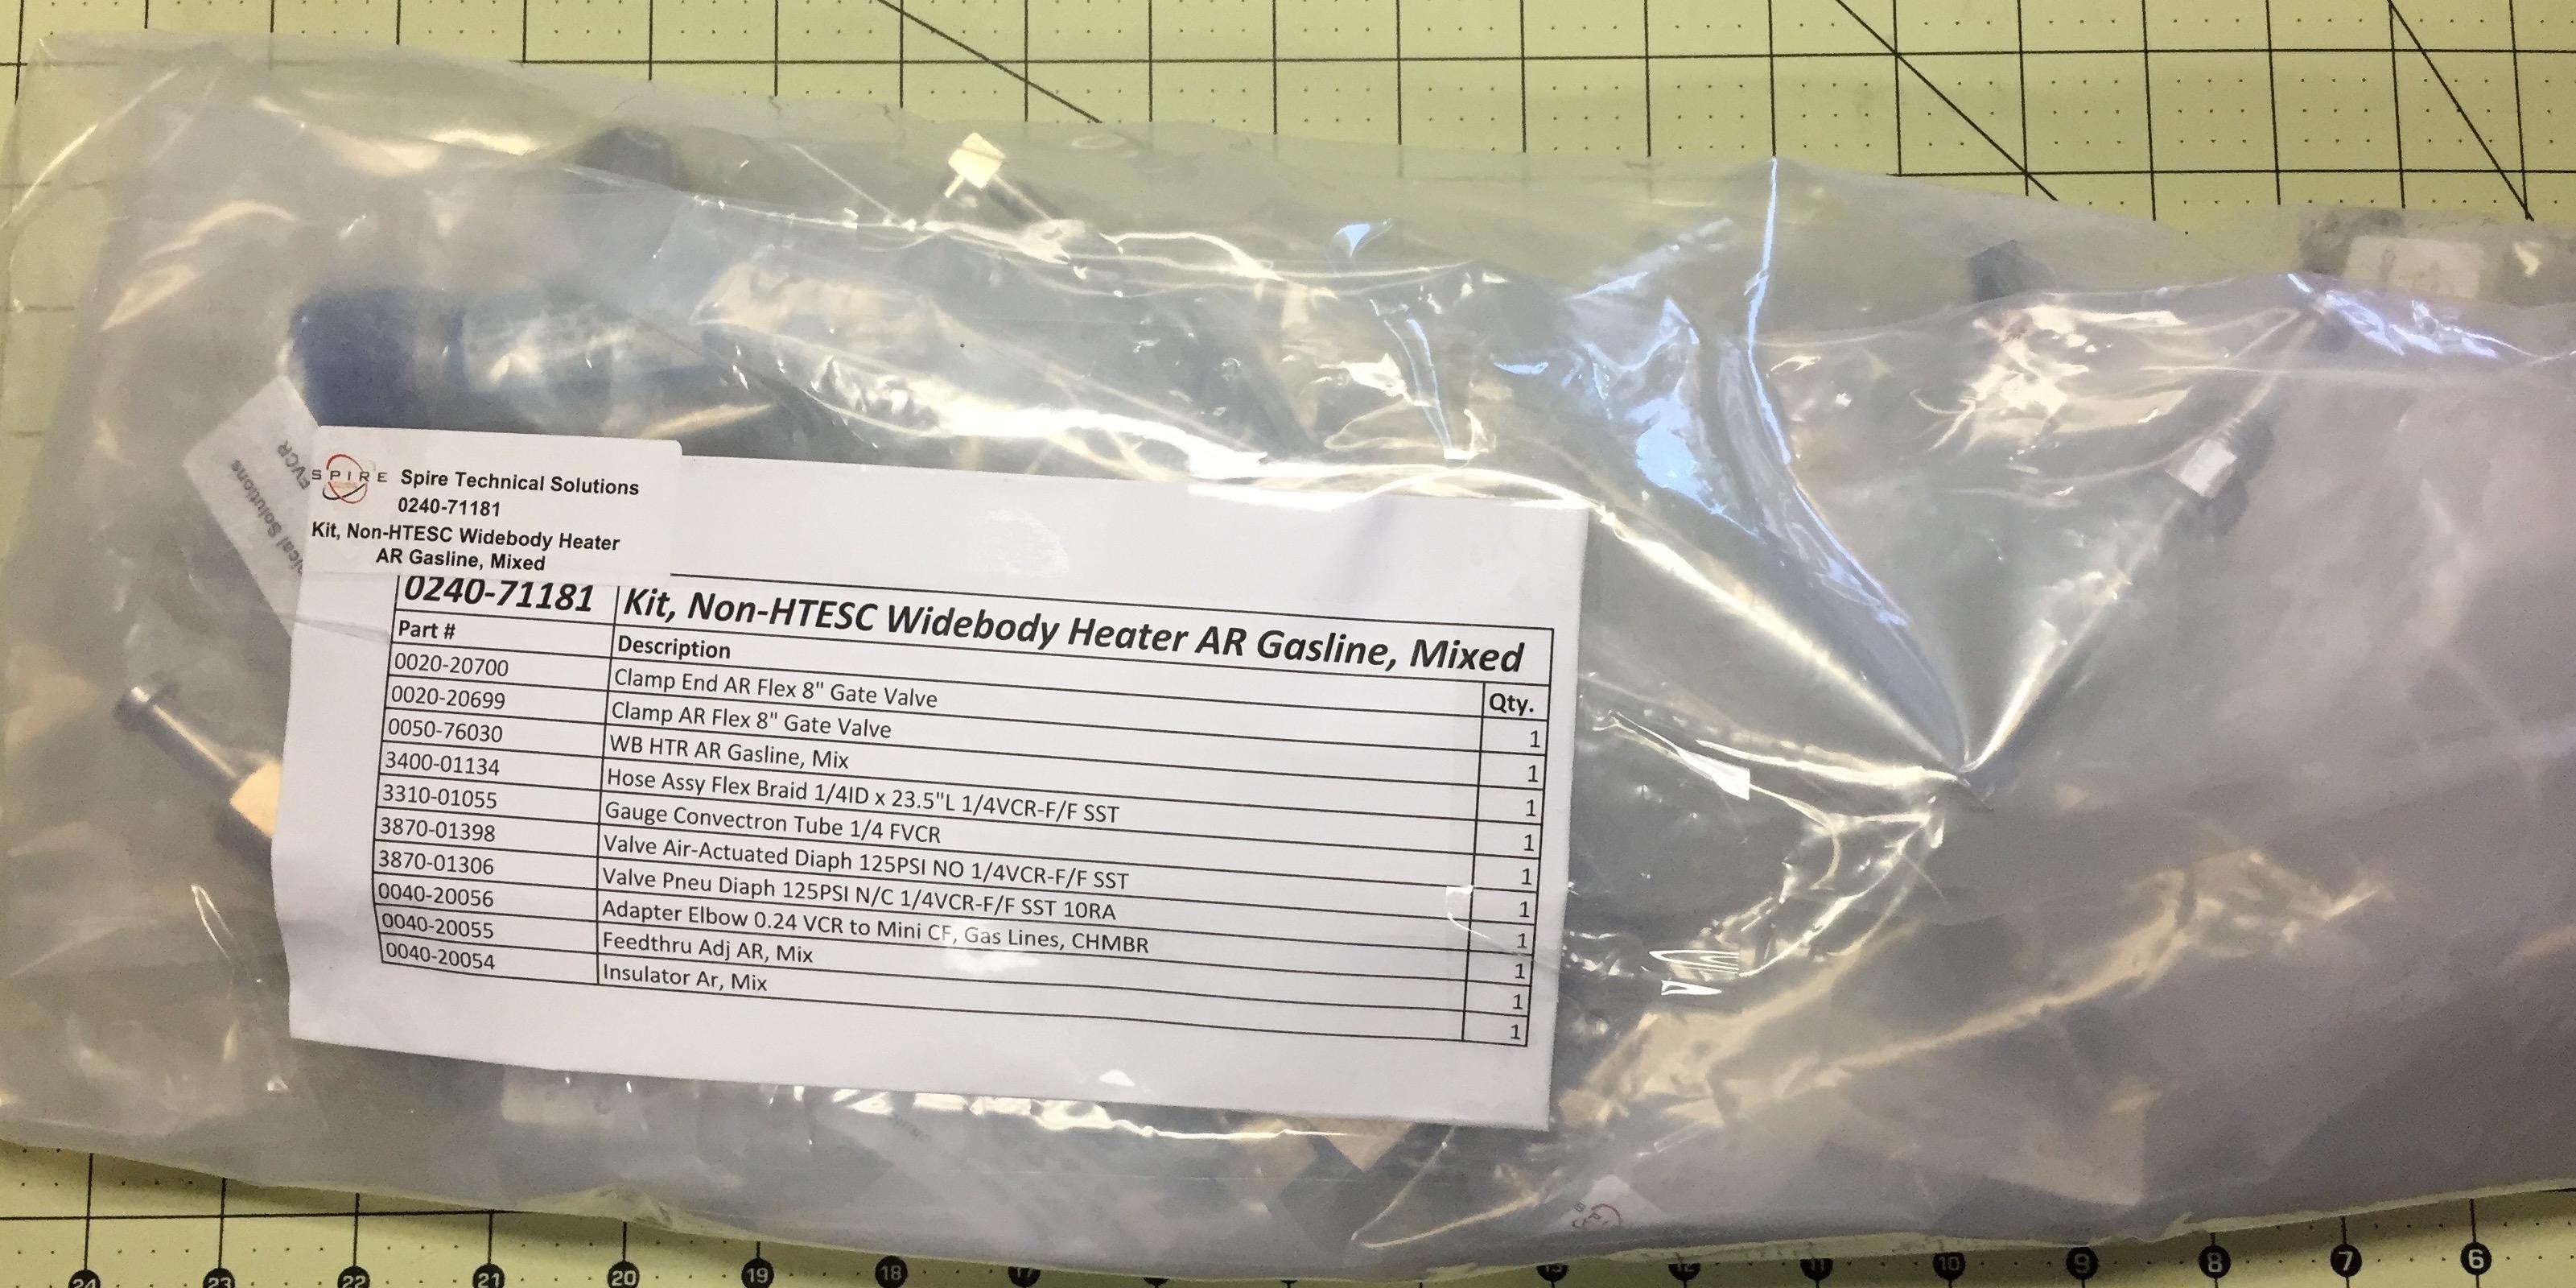 Kit, Non-HTESC WB Heater AR Gasline, Mixed